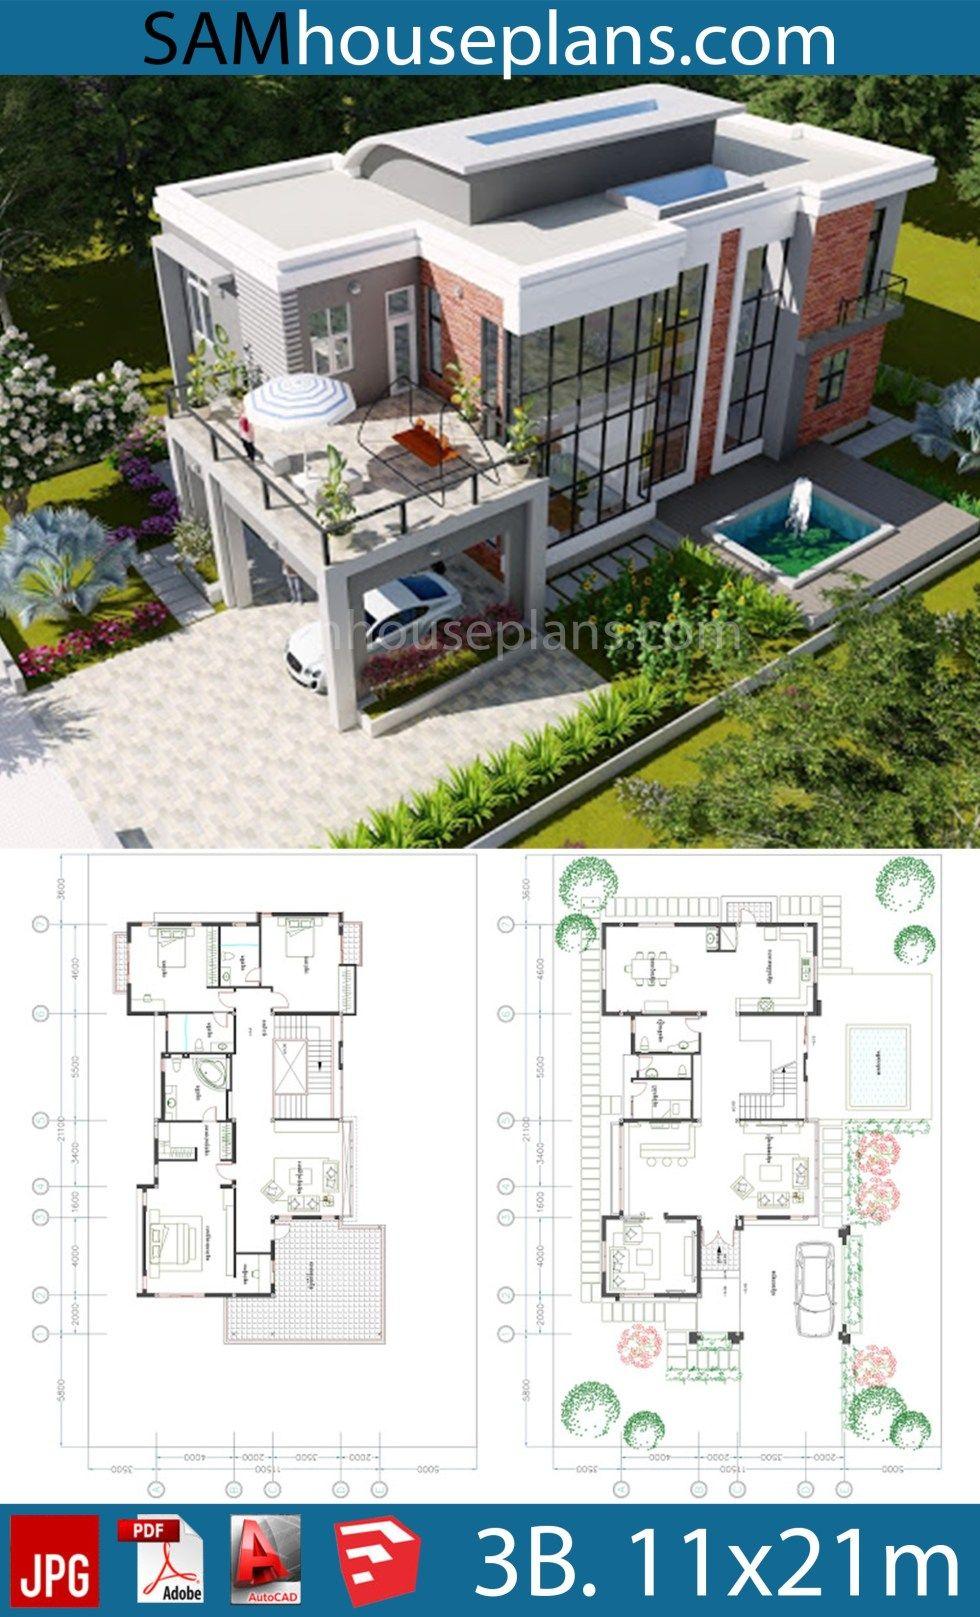 House Plans 11 5x21 1m With 3 Bedrooms Sam House Plans Architecture Model House Modern Villa Design Sims House Plans